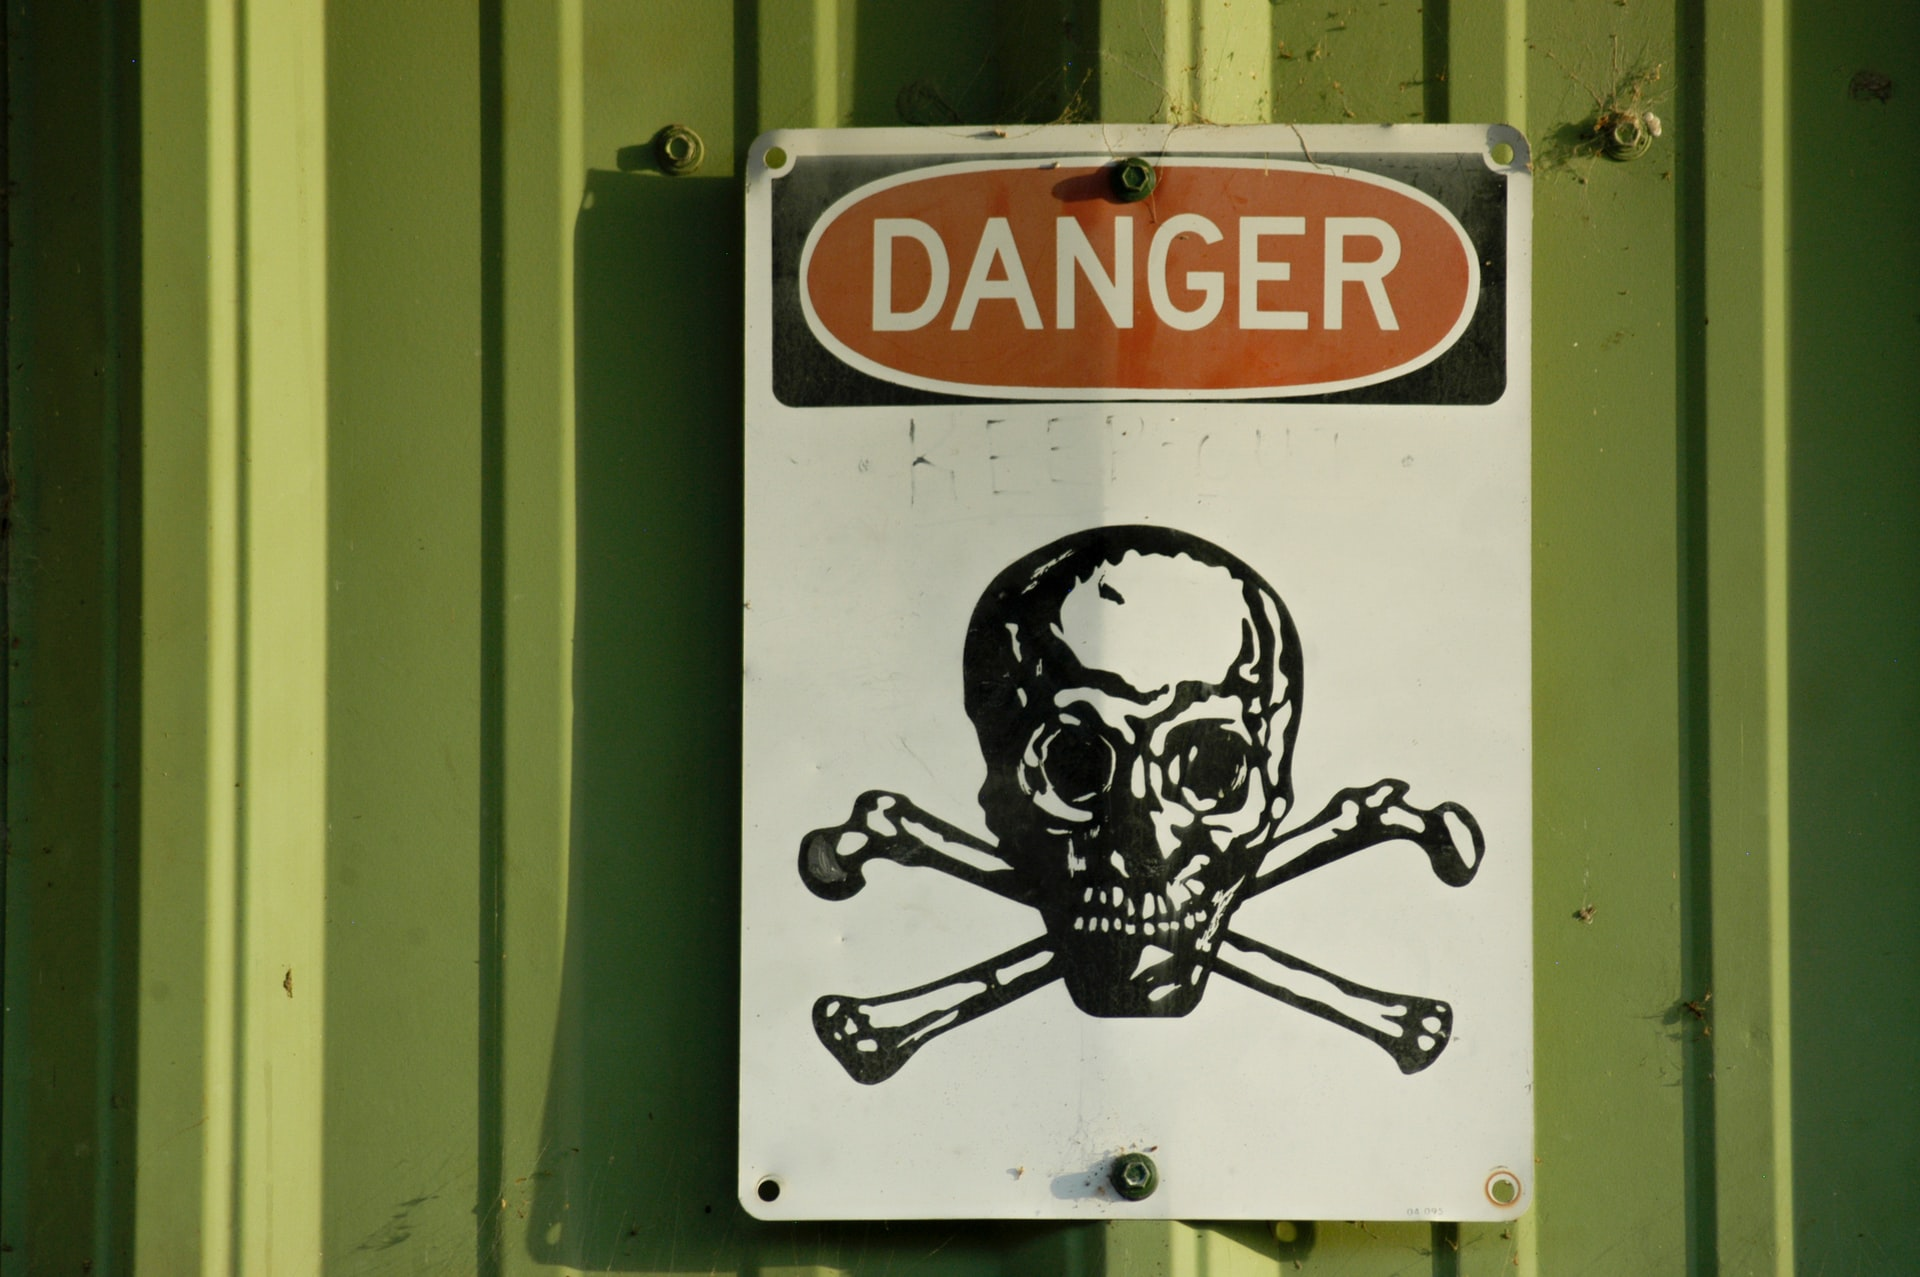 Attention, danger